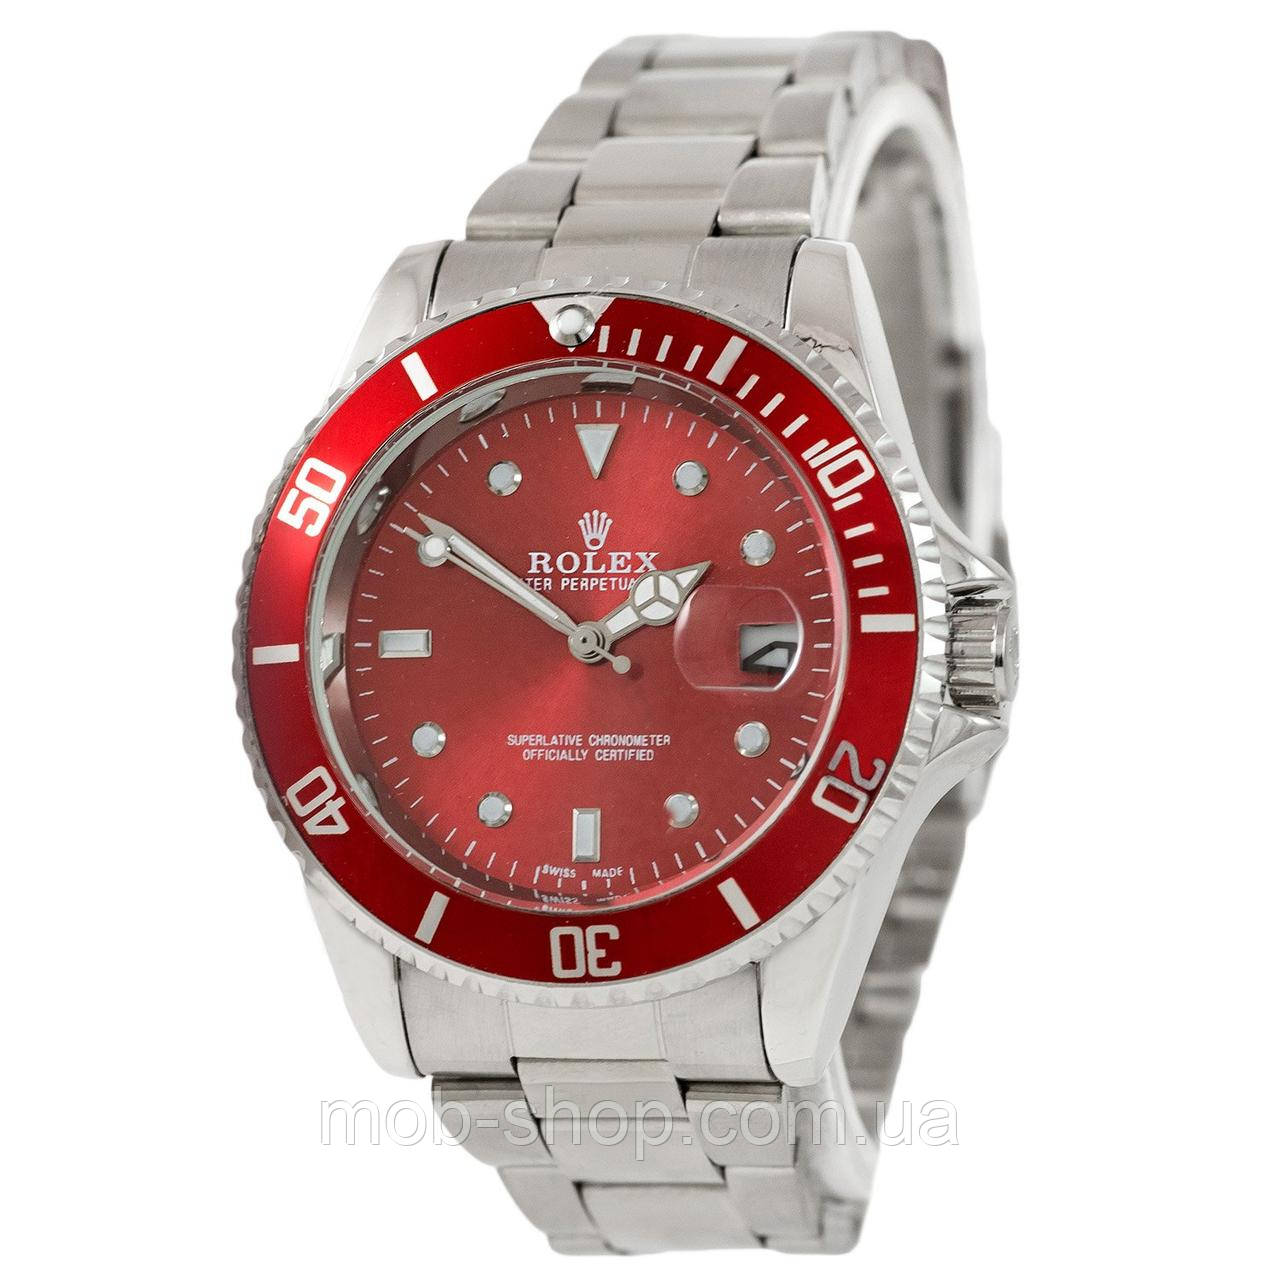 Наручные часы Rolex Submariner 2128 Quarts Silver-Red